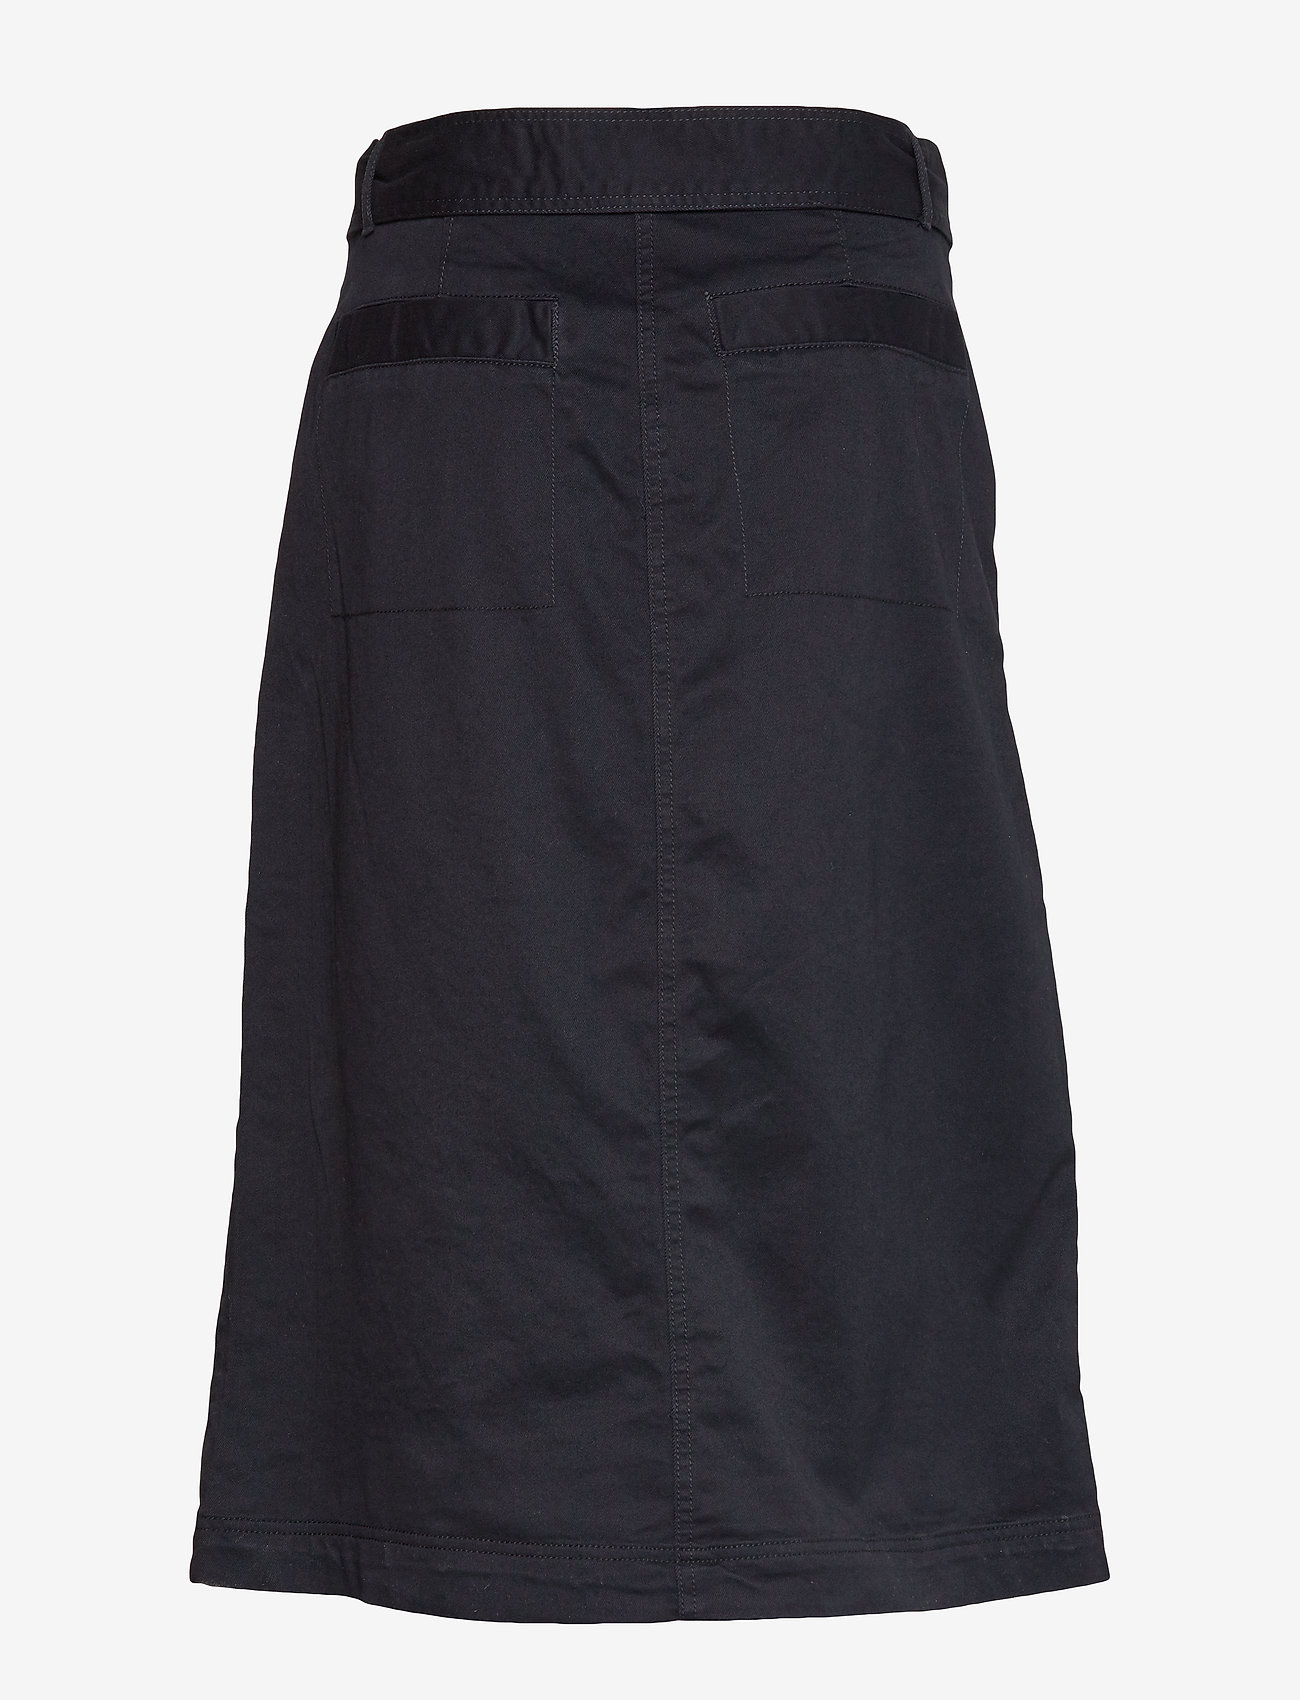 InWear MavisIW Skirt - Skjørt MARINE BLUE - Dameklær Spesialtilbud